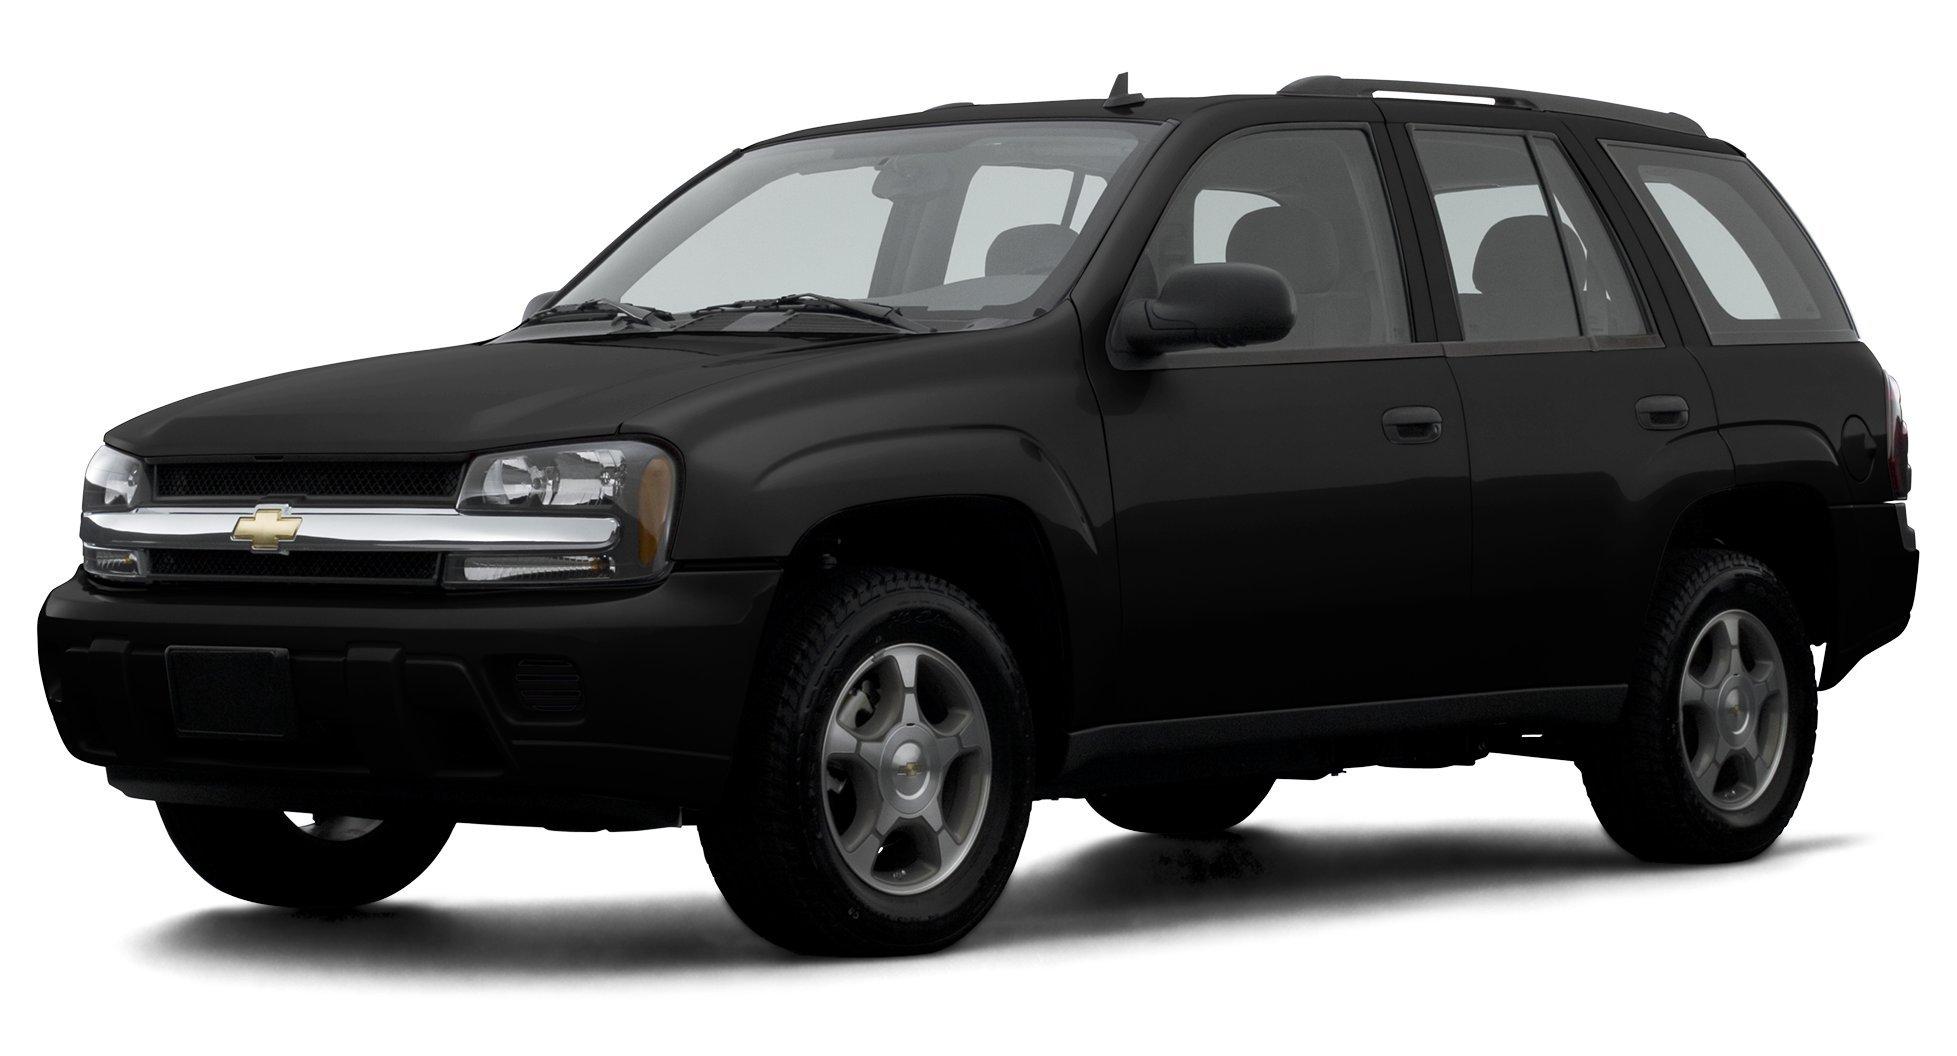 Amazon 2007 Chevrolet Trailblazer Reviews and Specs